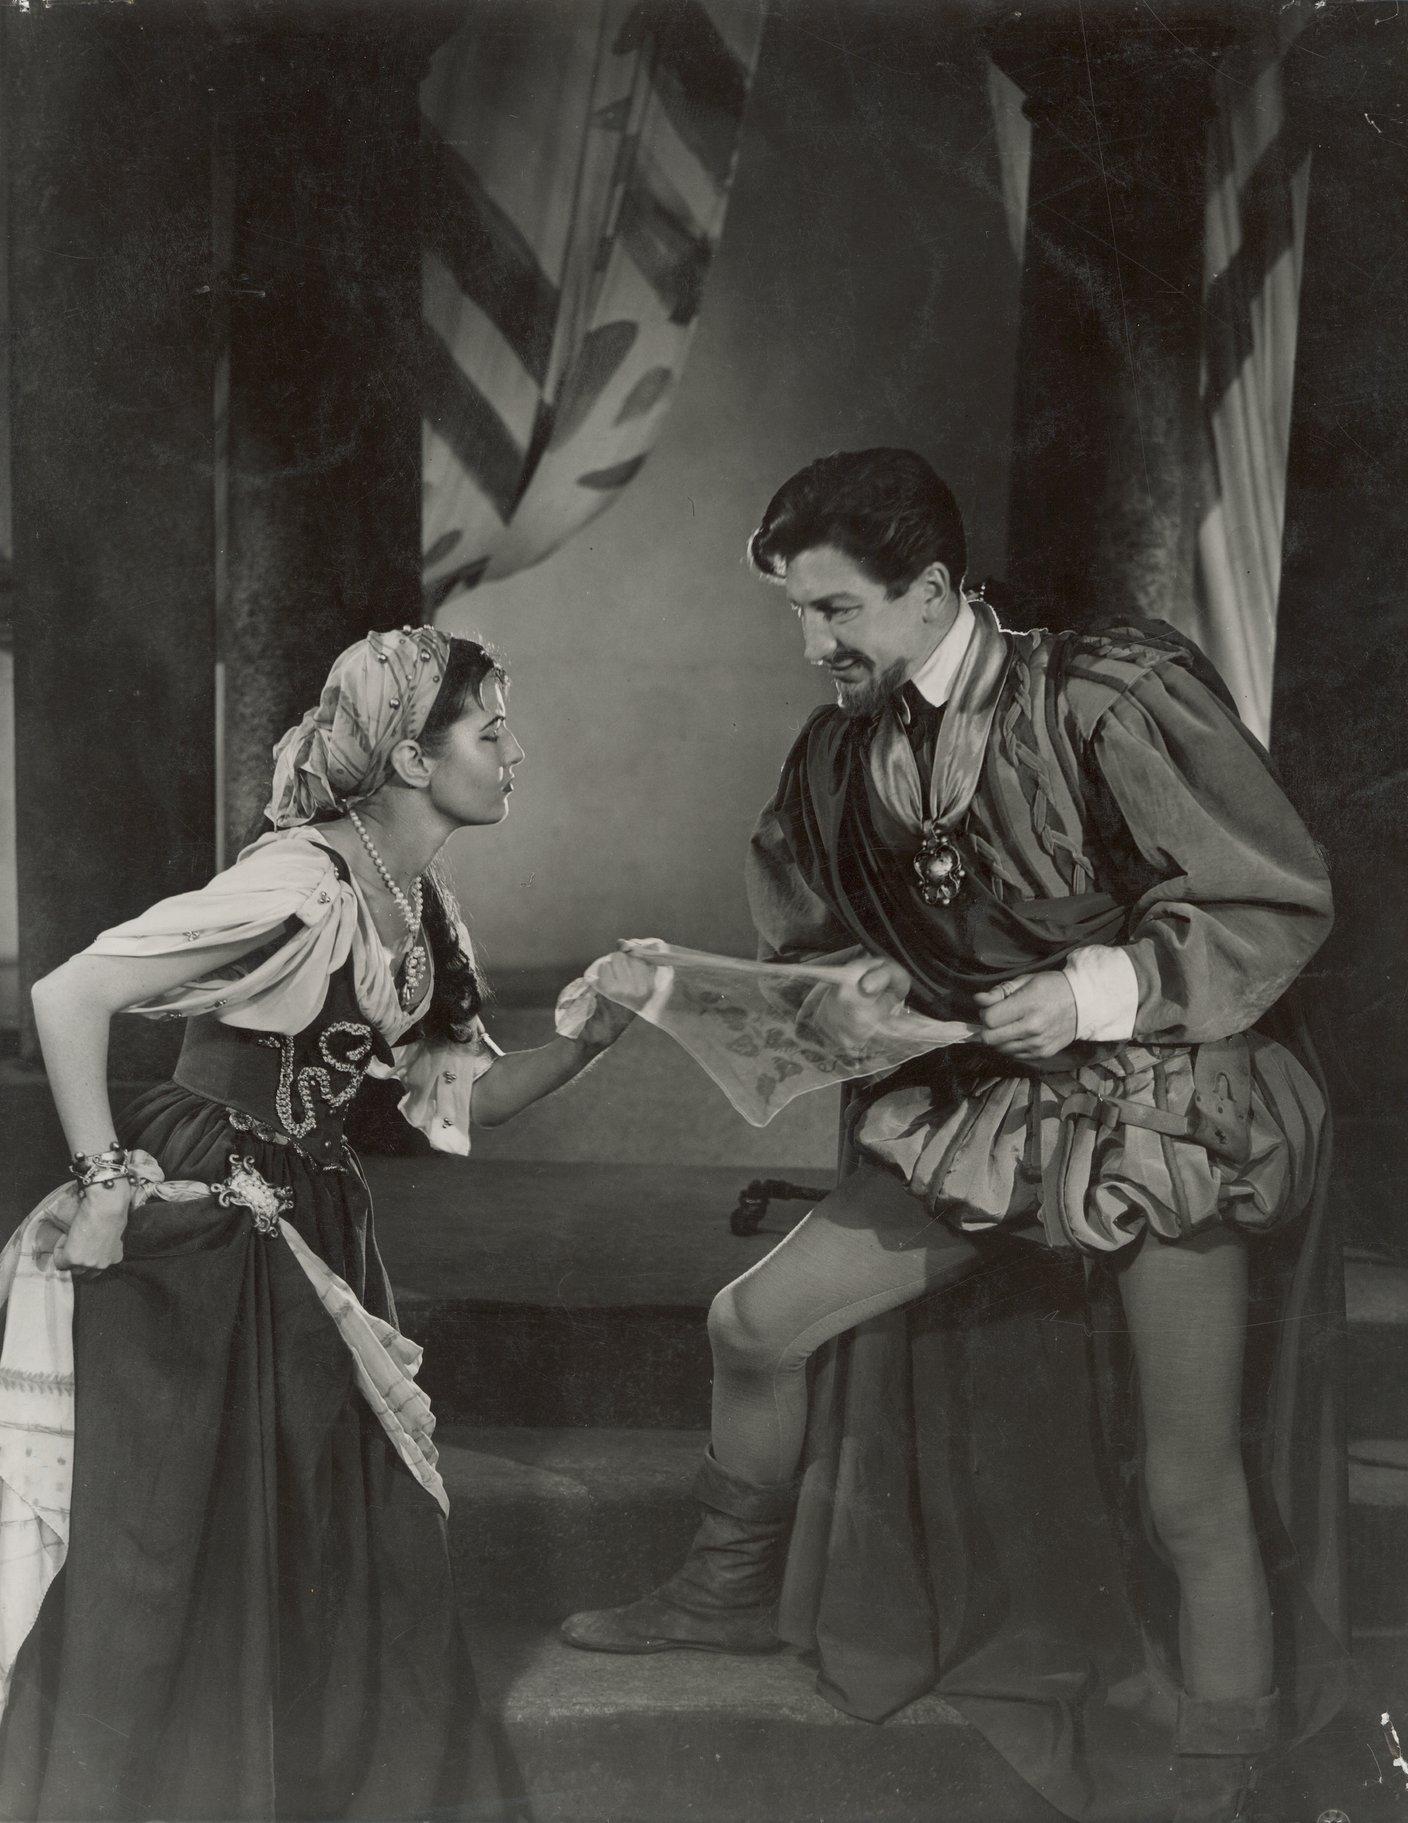 Bianca gives Cassio Desdemona's handkerchief.